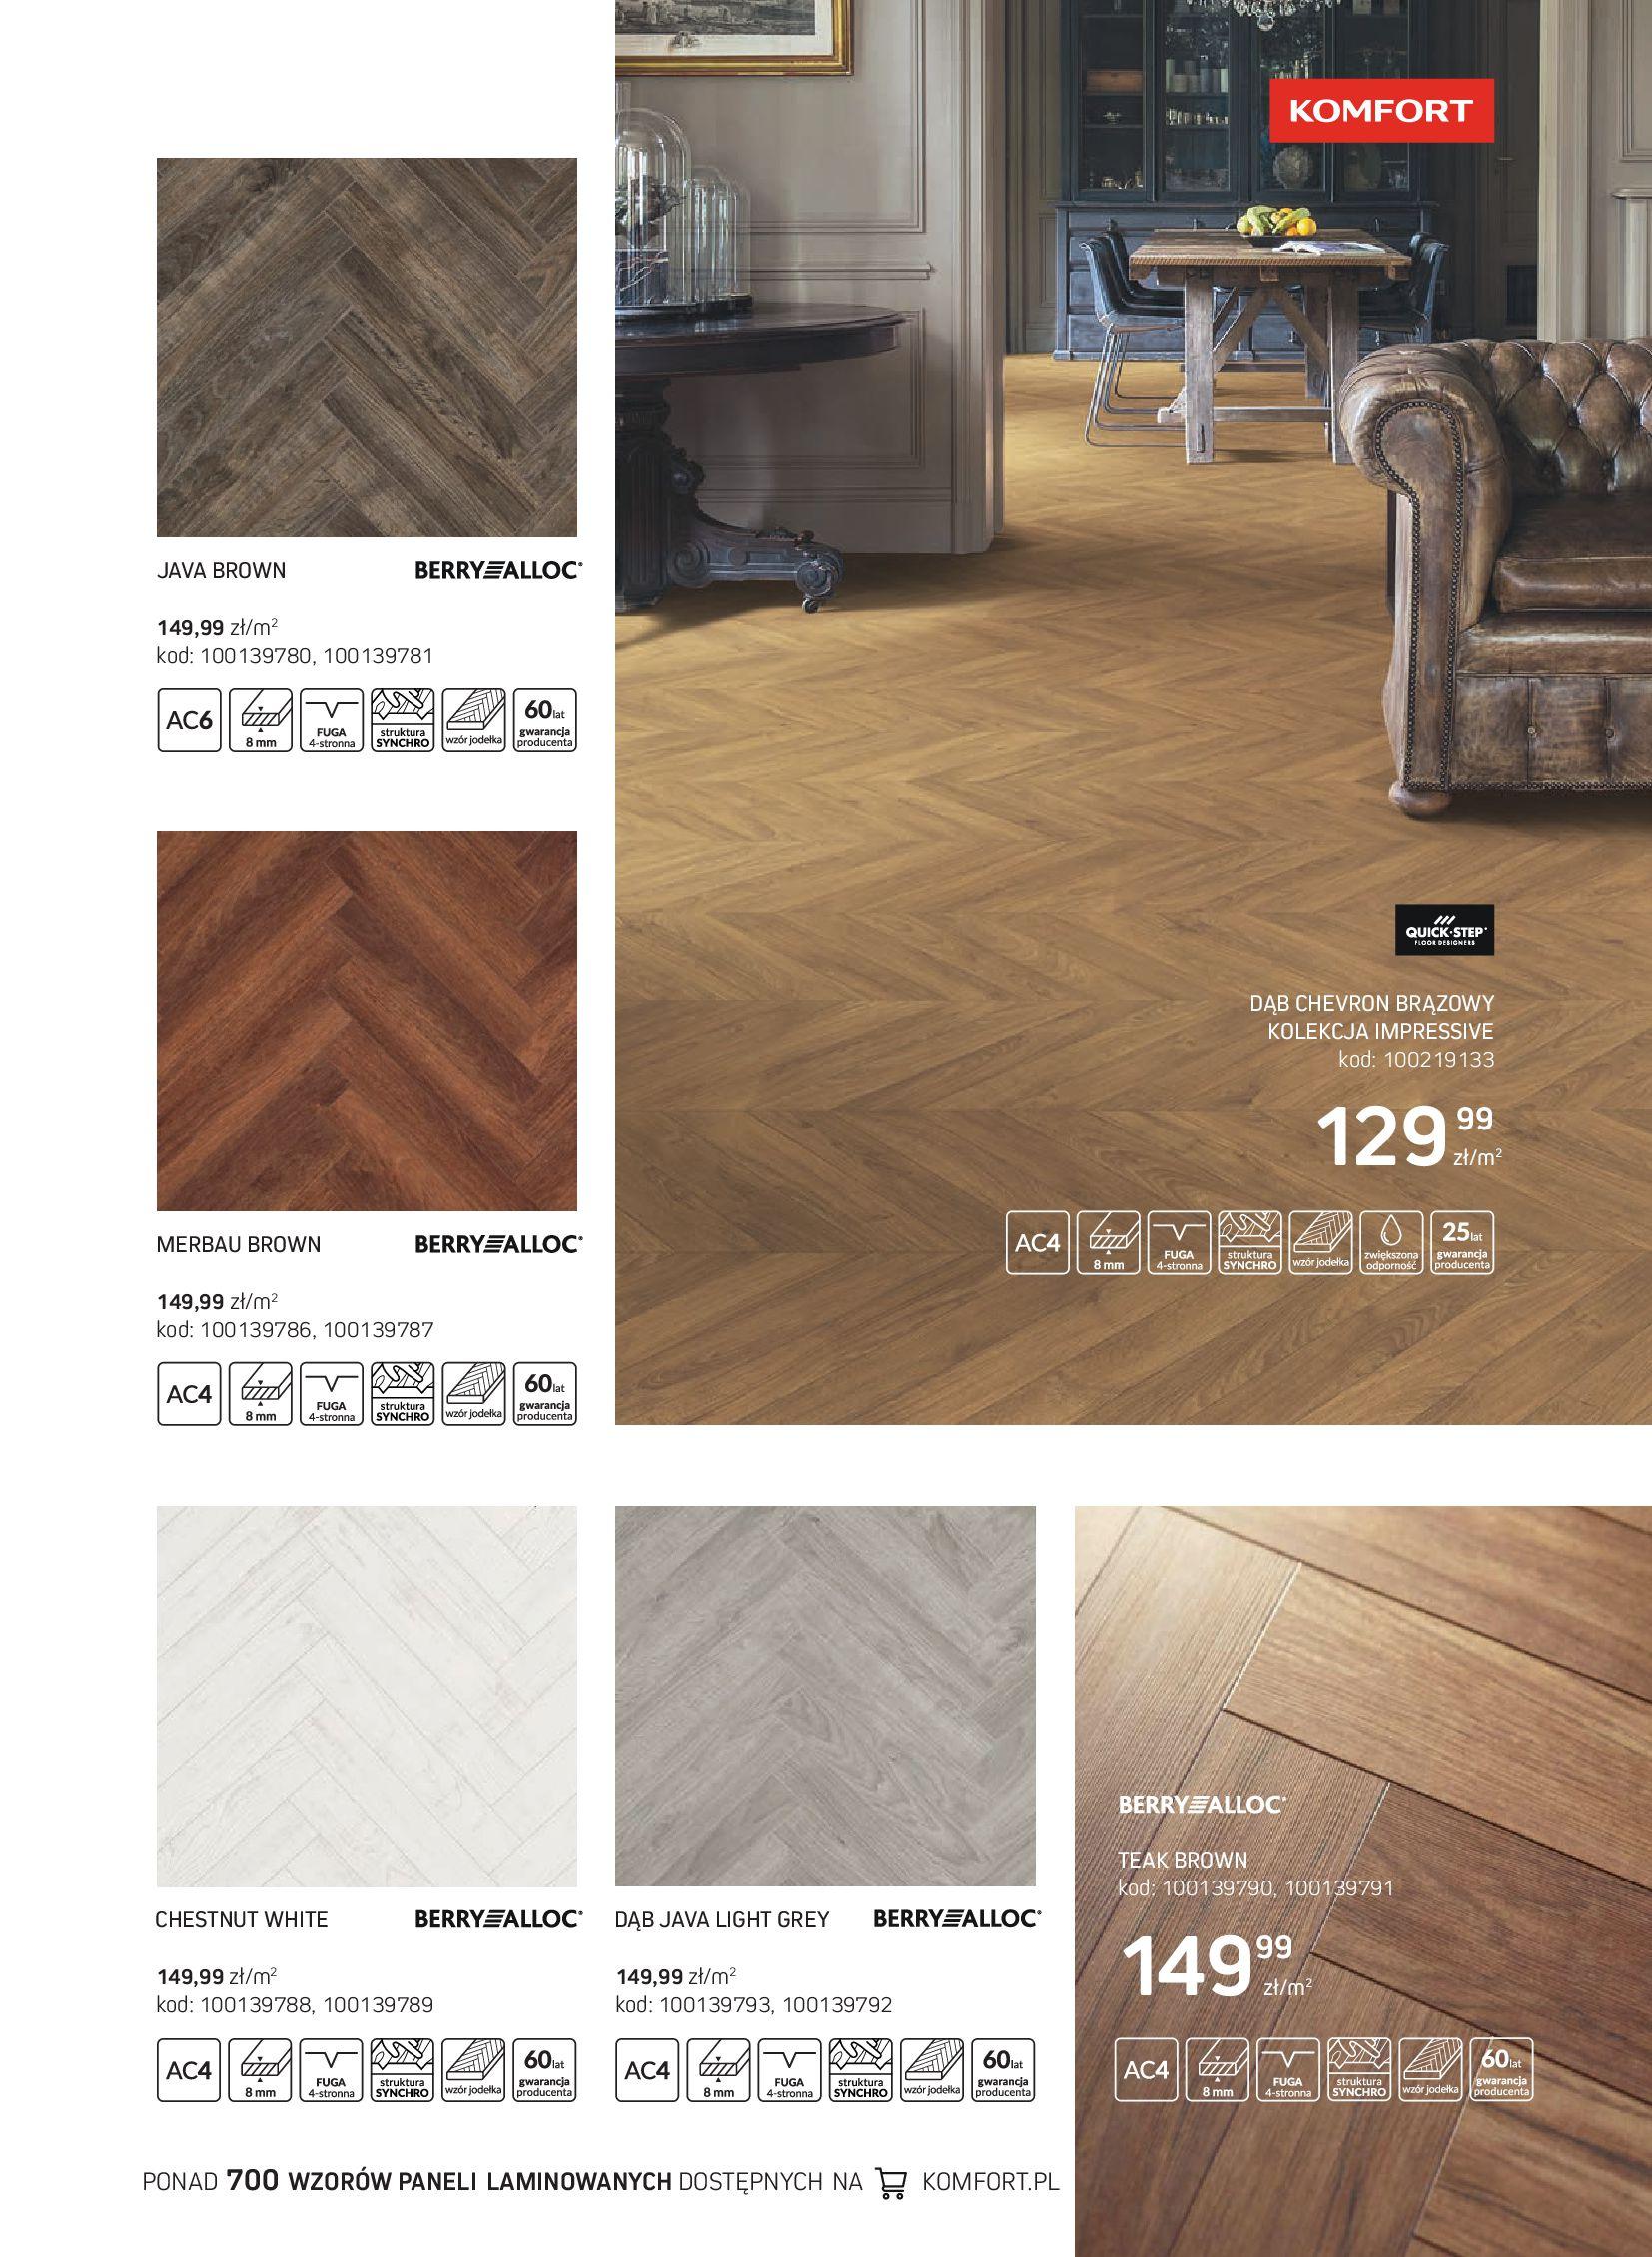 Gazetka Komfort: Gazetka Komfort - Katalog podłogi i drzwi 2021-06-16 page-33